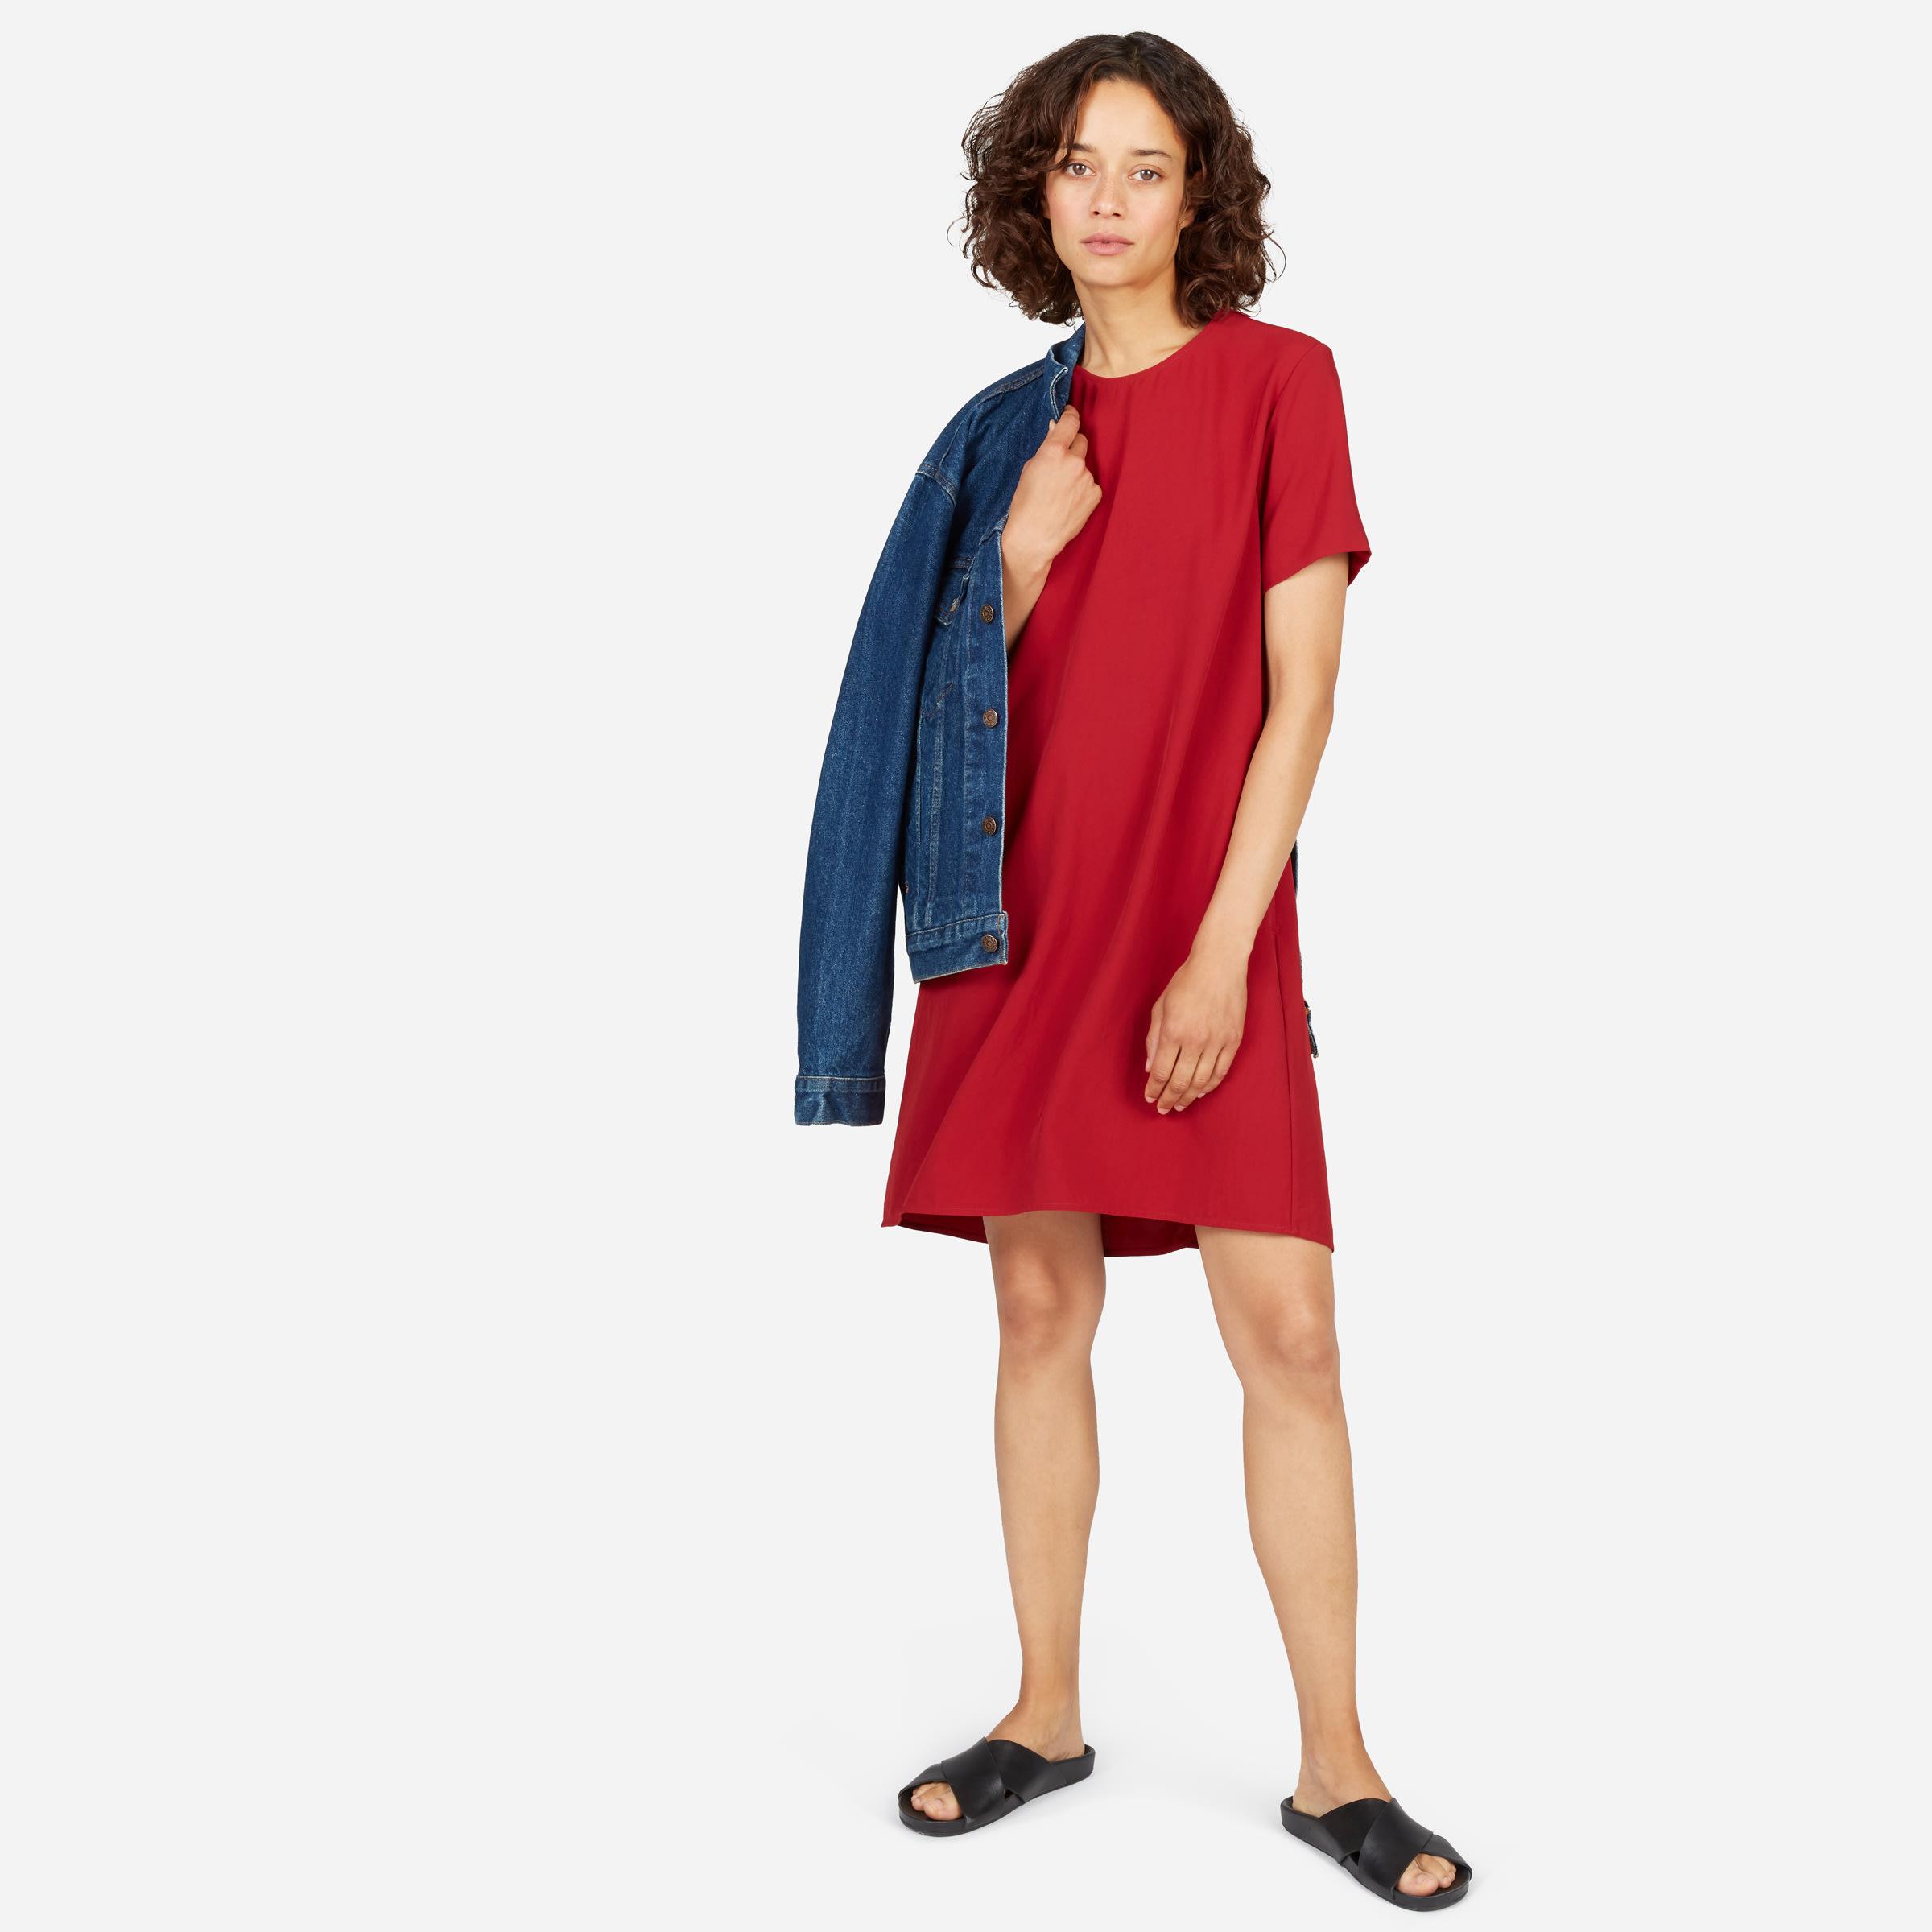 7bfbd4117a Women's Japanese GoWeave Short-Sleeve A-Line Dress   Everlane